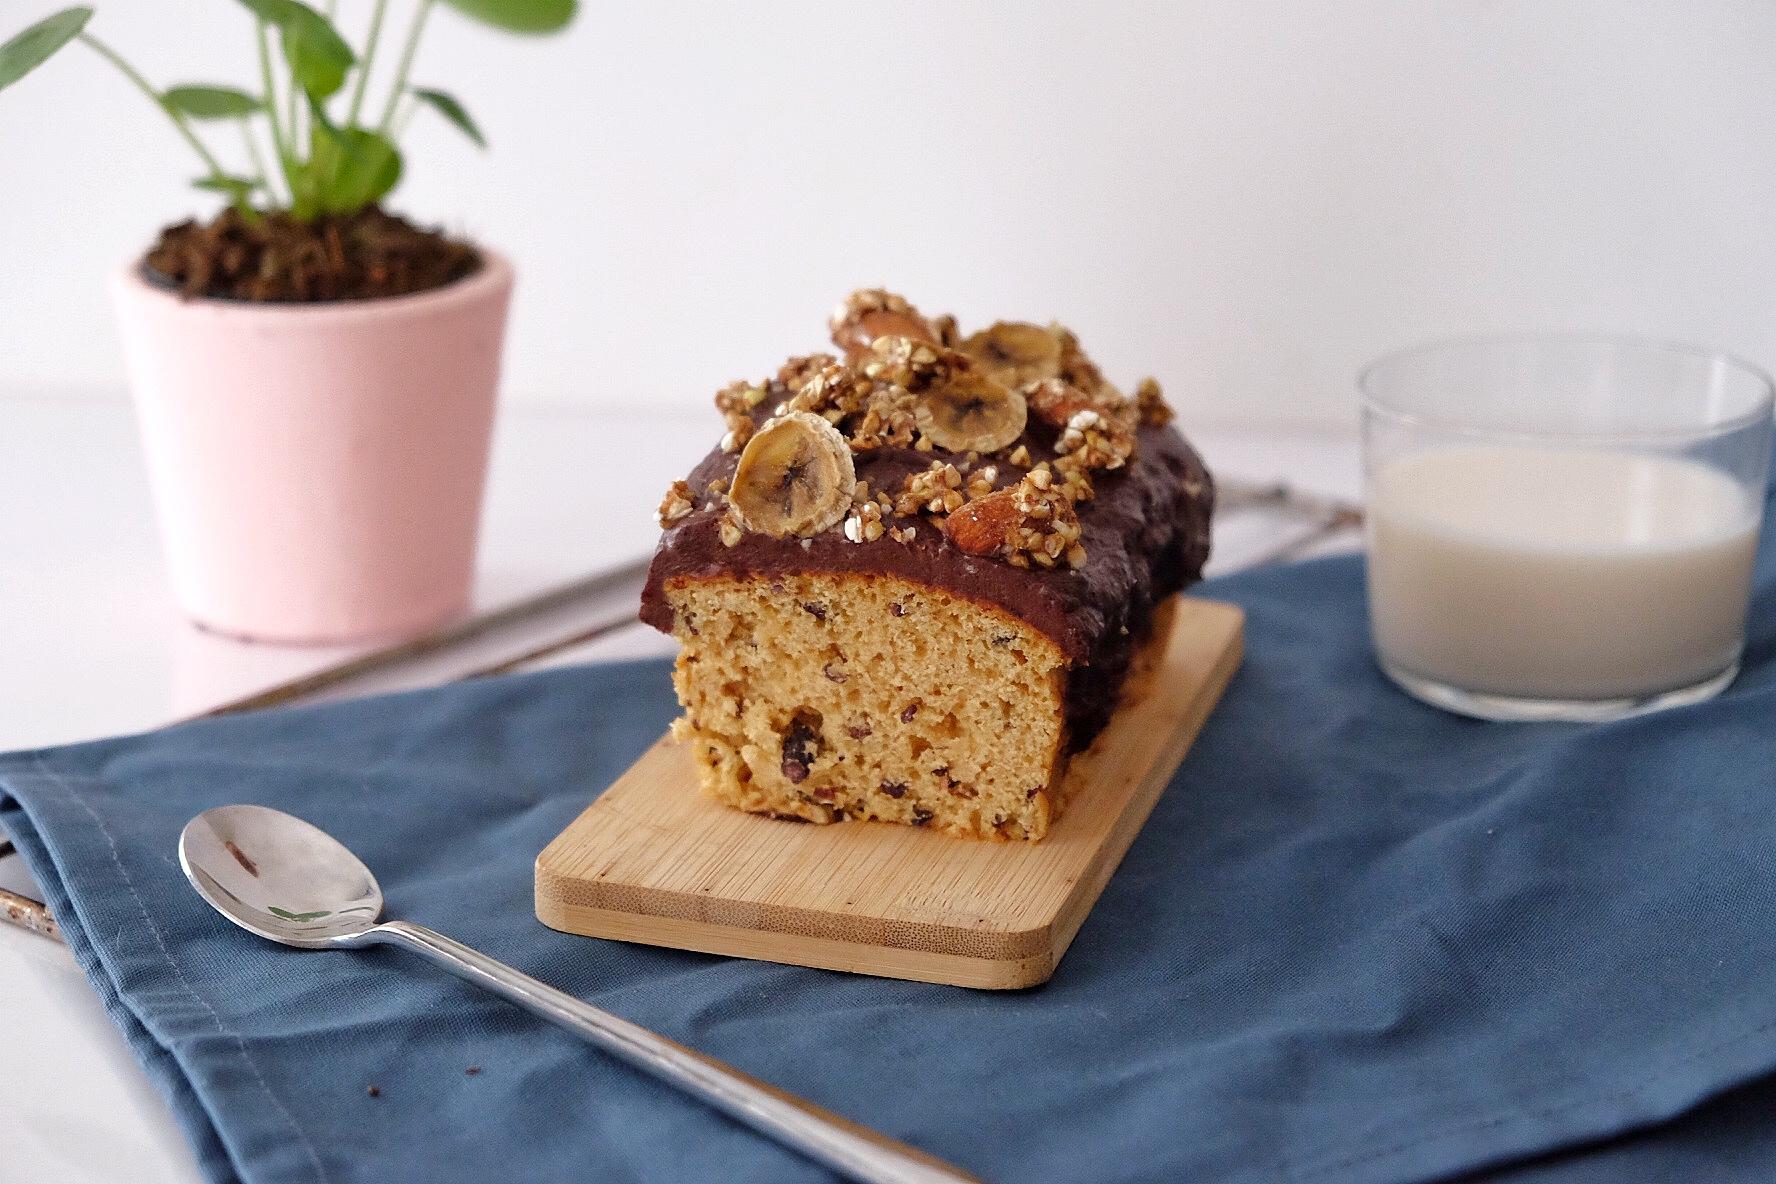 Vegan cake with orange blossom water and crispy muesli